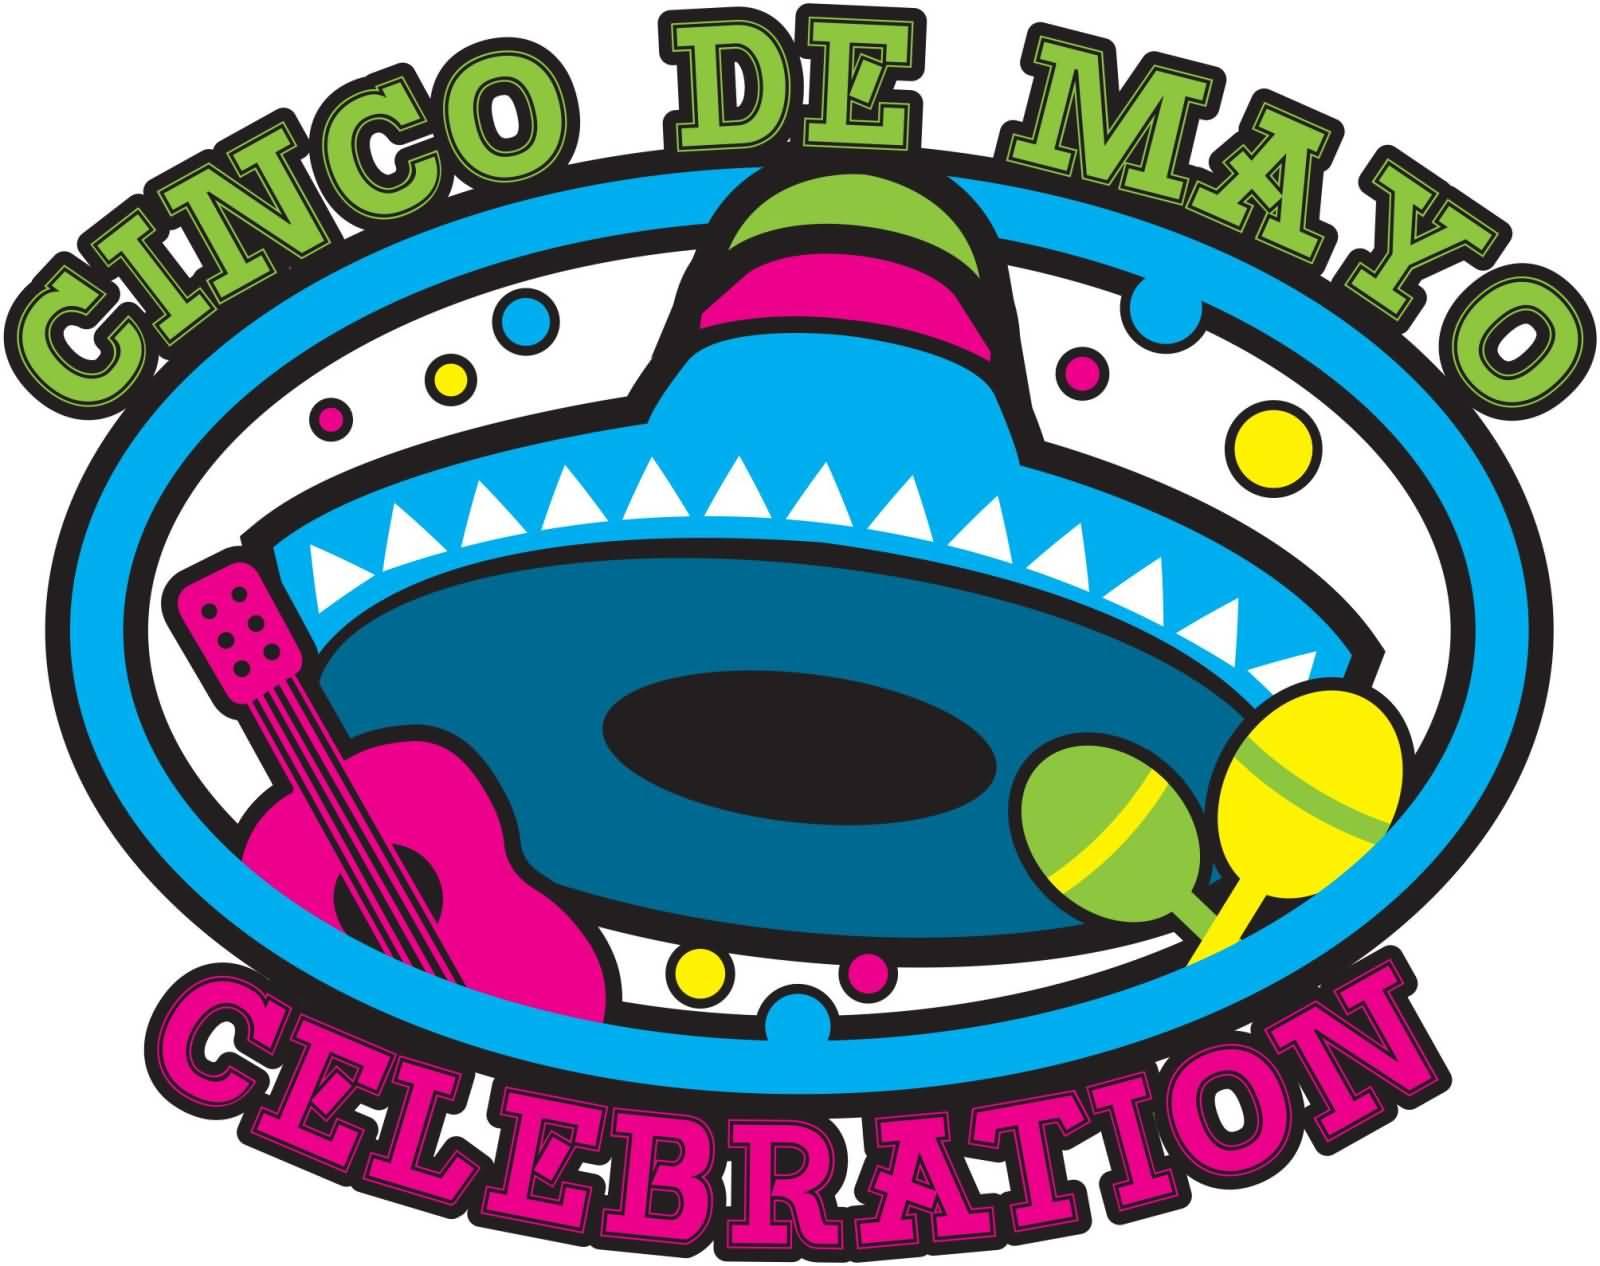 cinco de mayo celebration clipart rh askideas com cinco de mayo clip art jpg cinco de mayo clipart